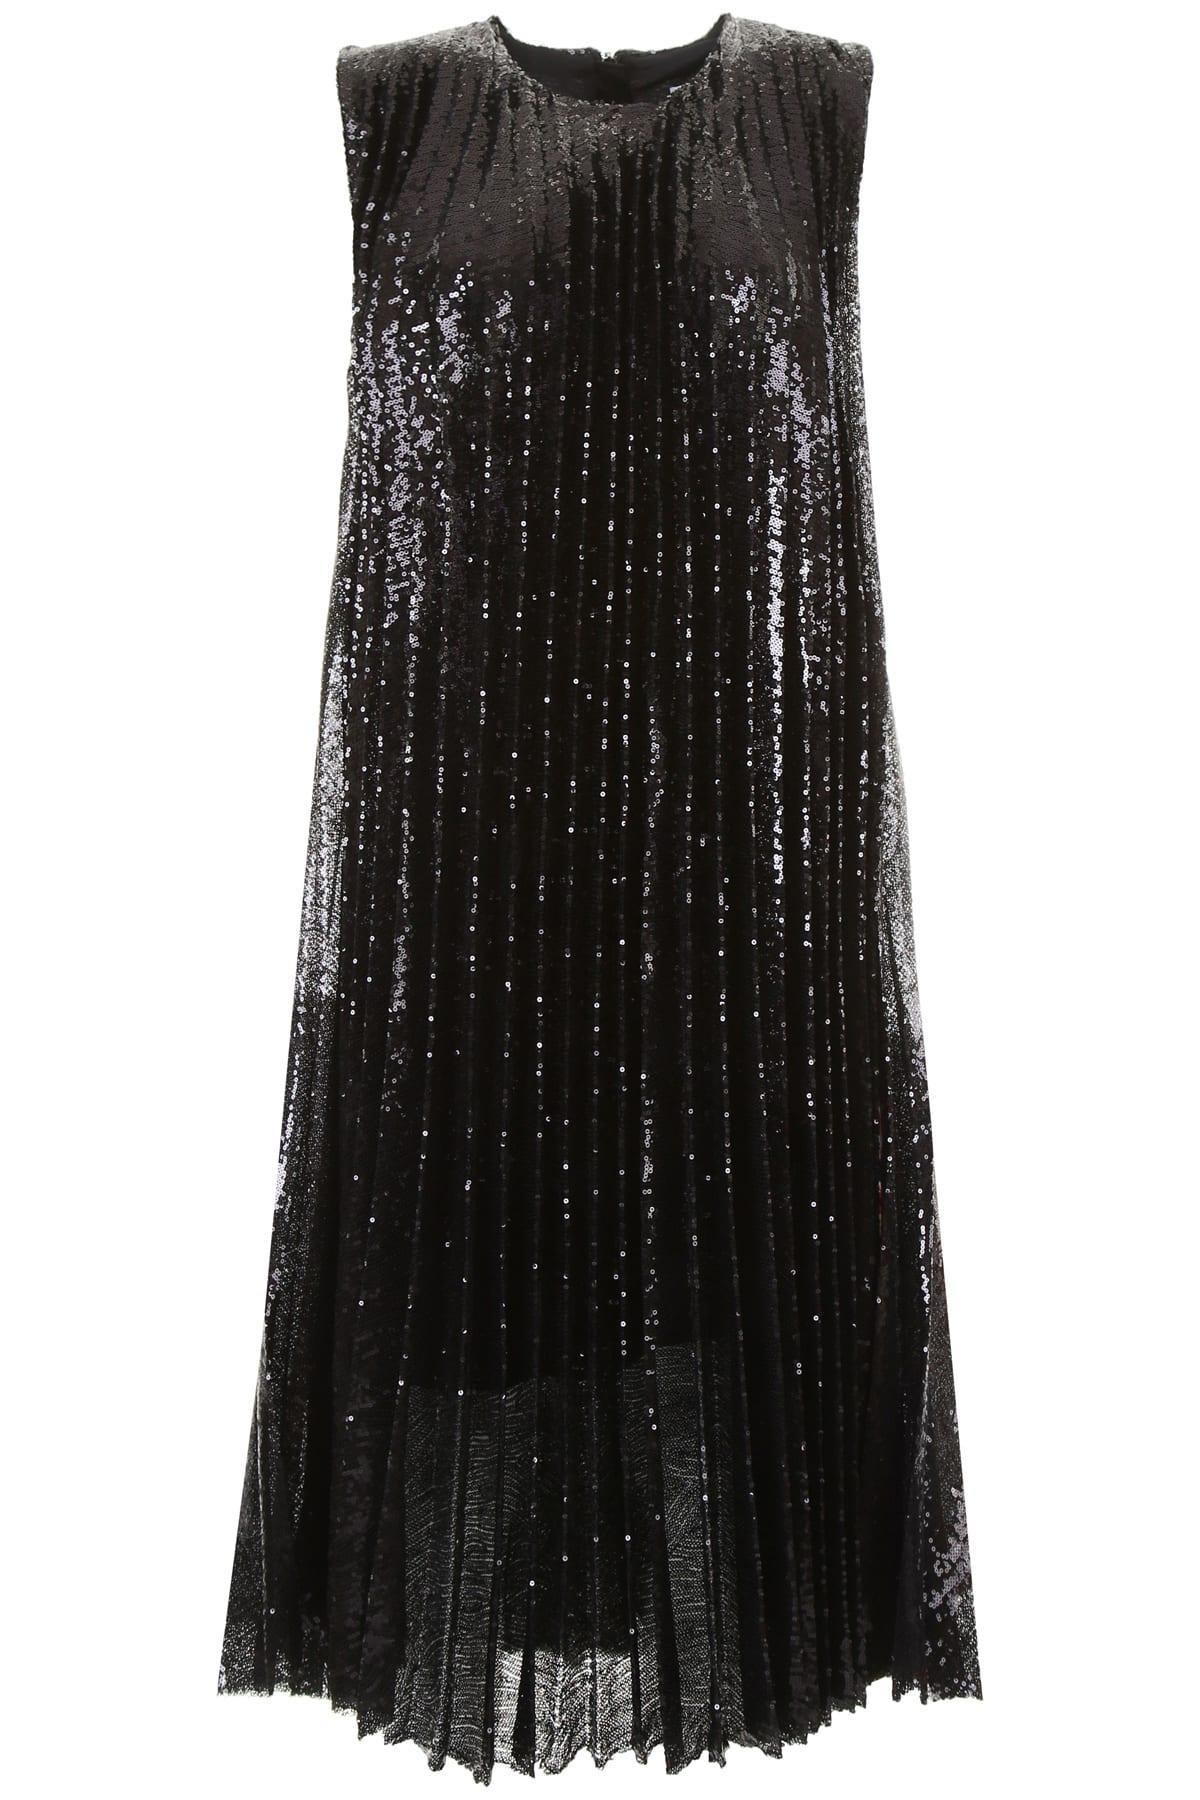 MSGM Micro Sequin Dress